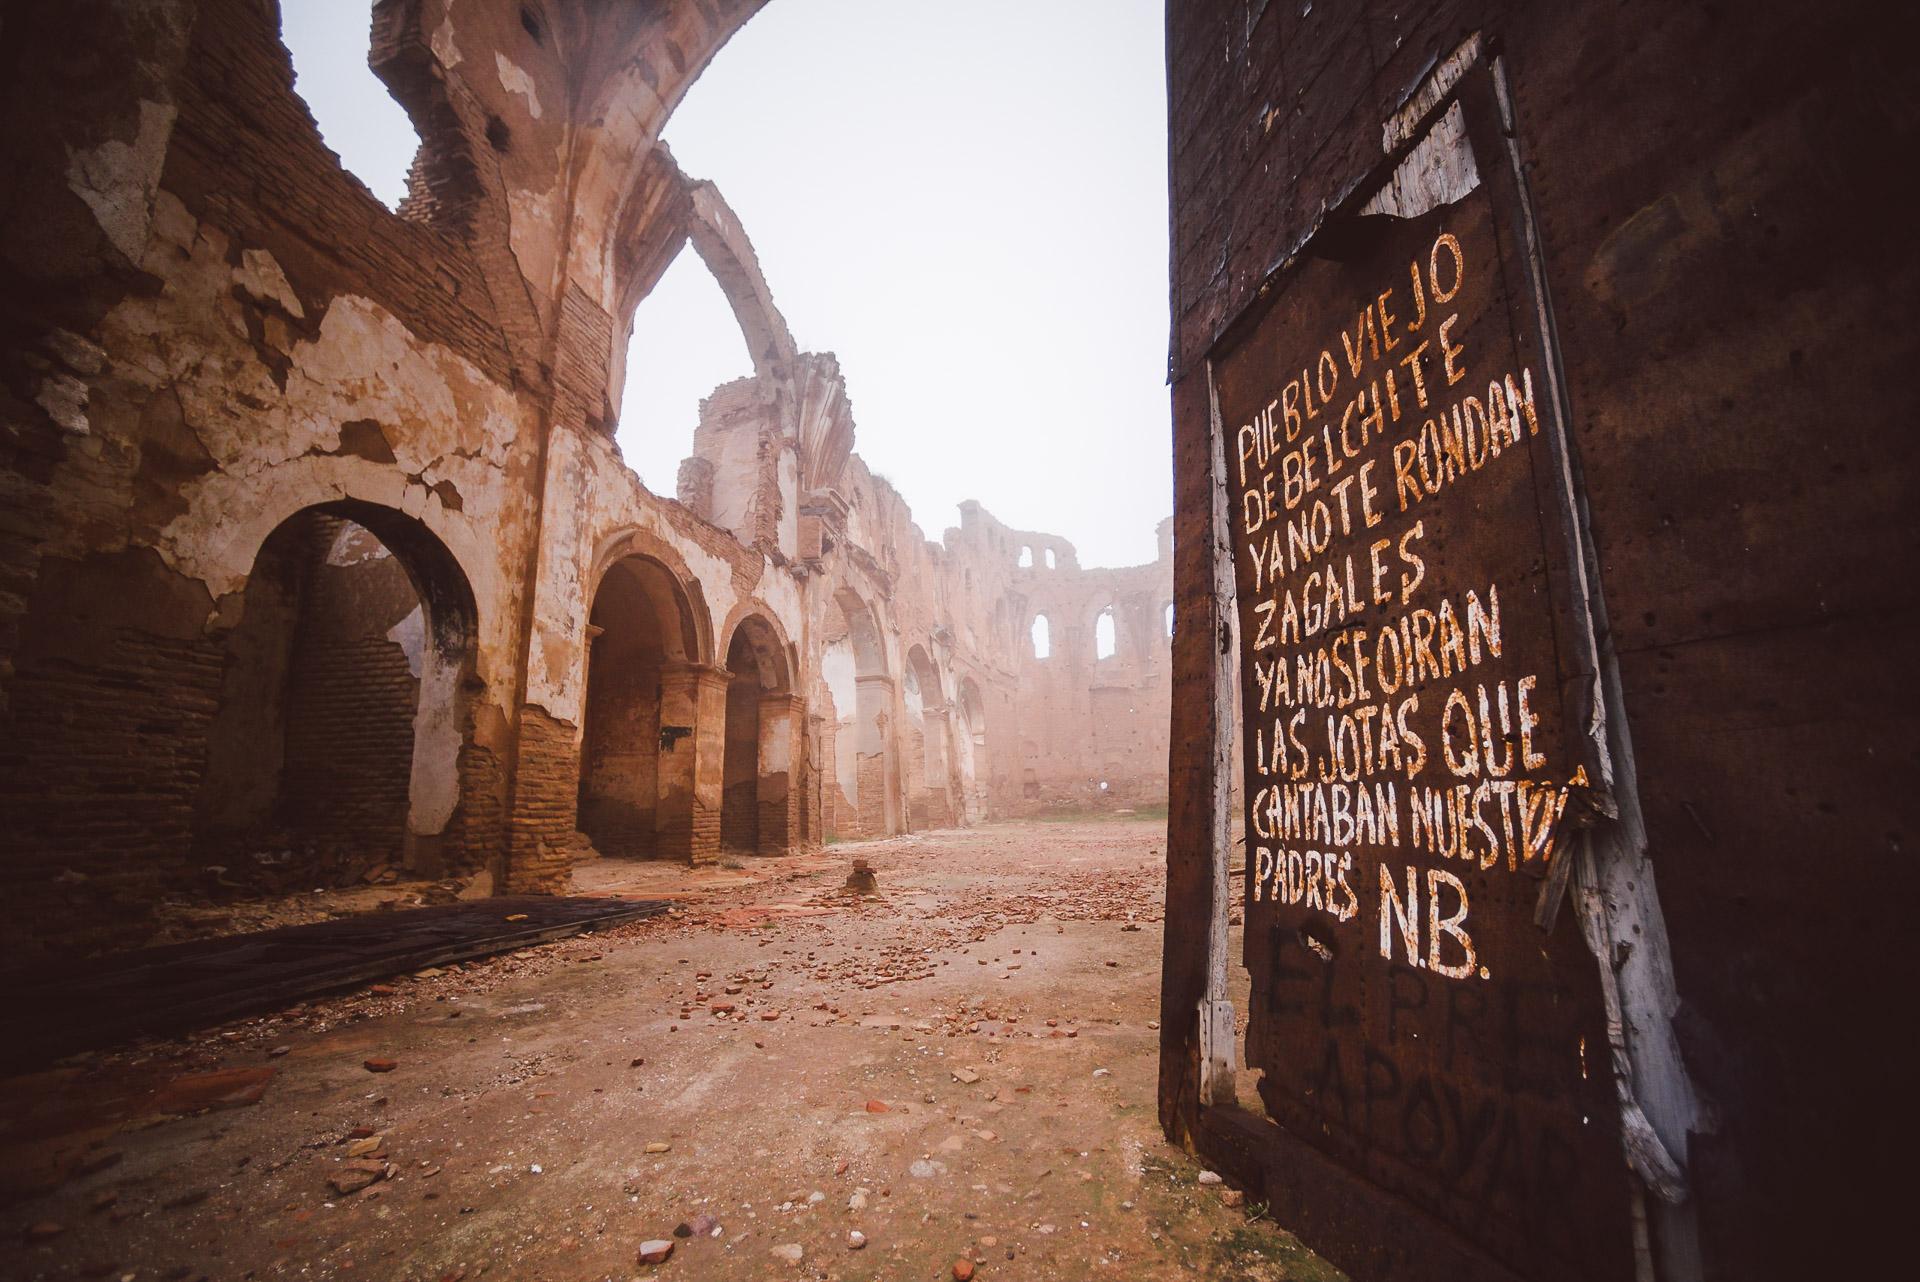 Belchite, Canal Historia, jose salto, fotógrafo freelance